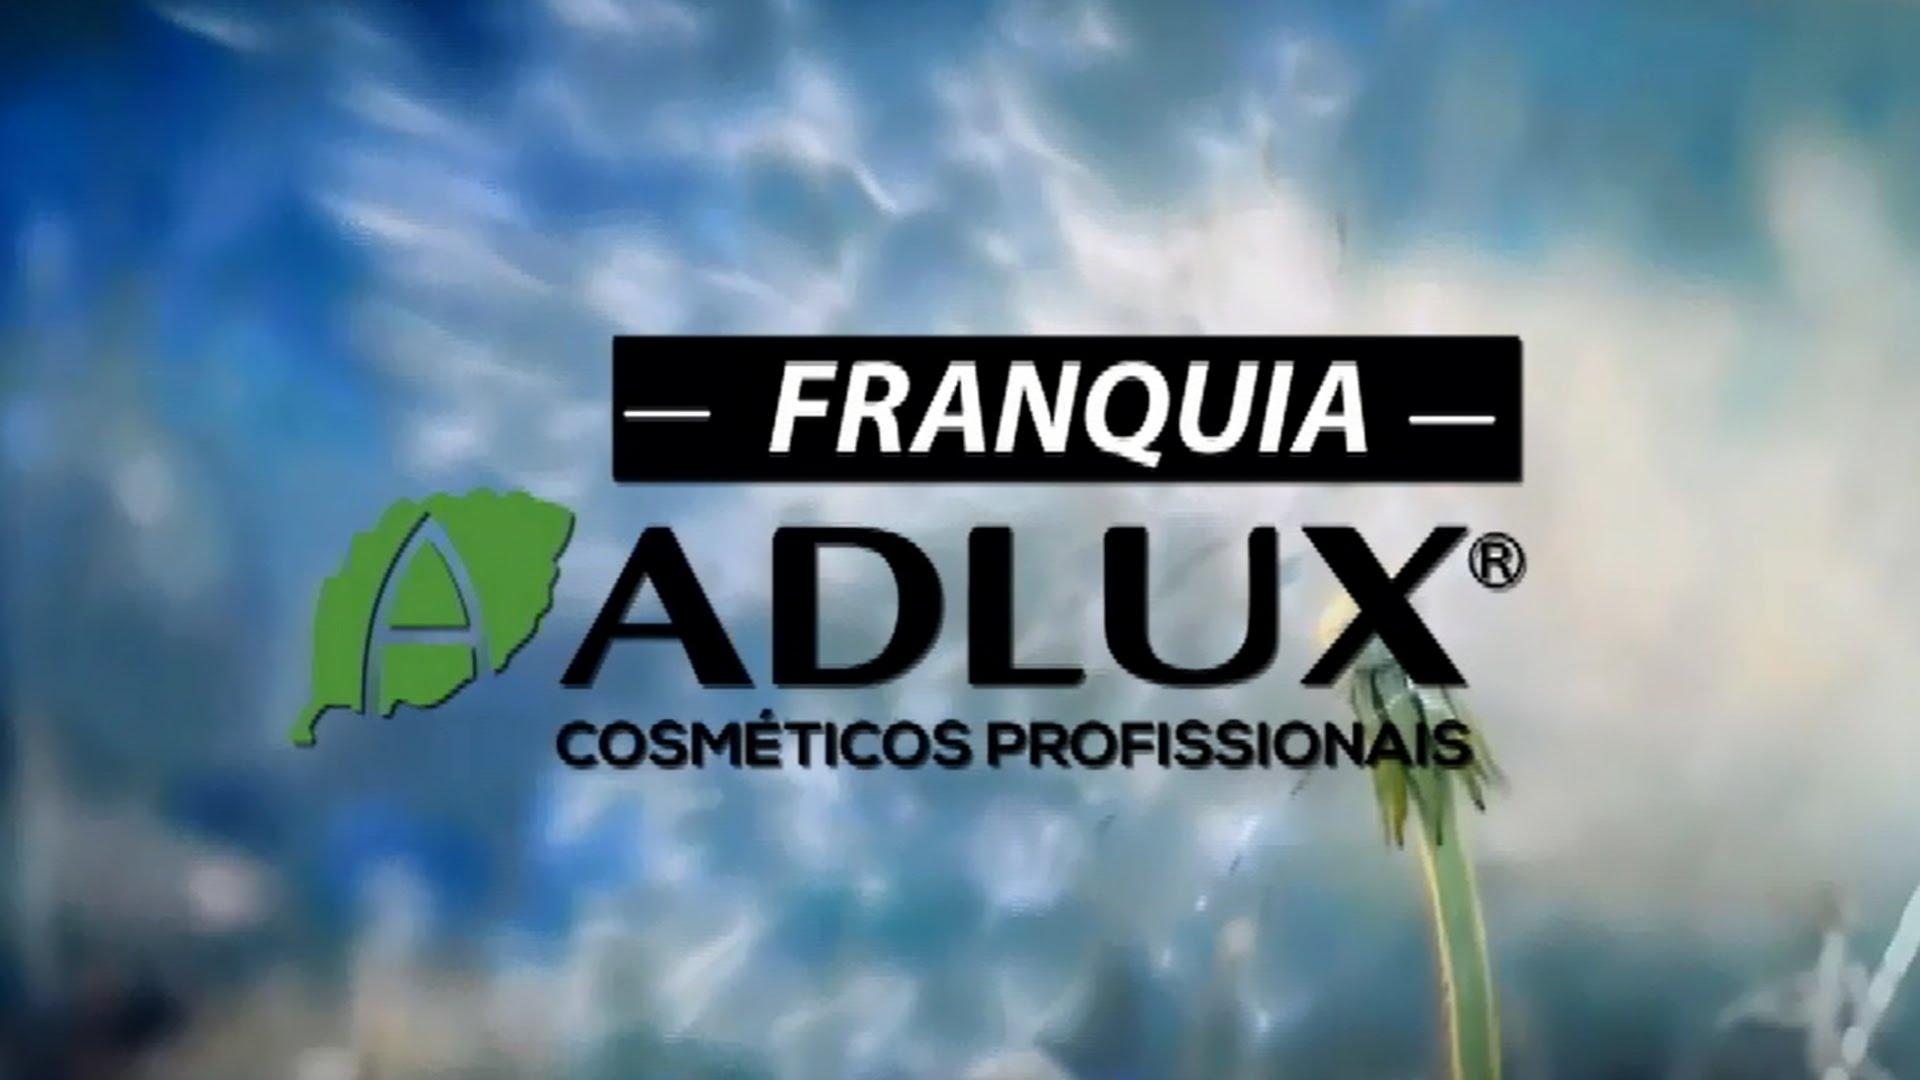 adlux franquia